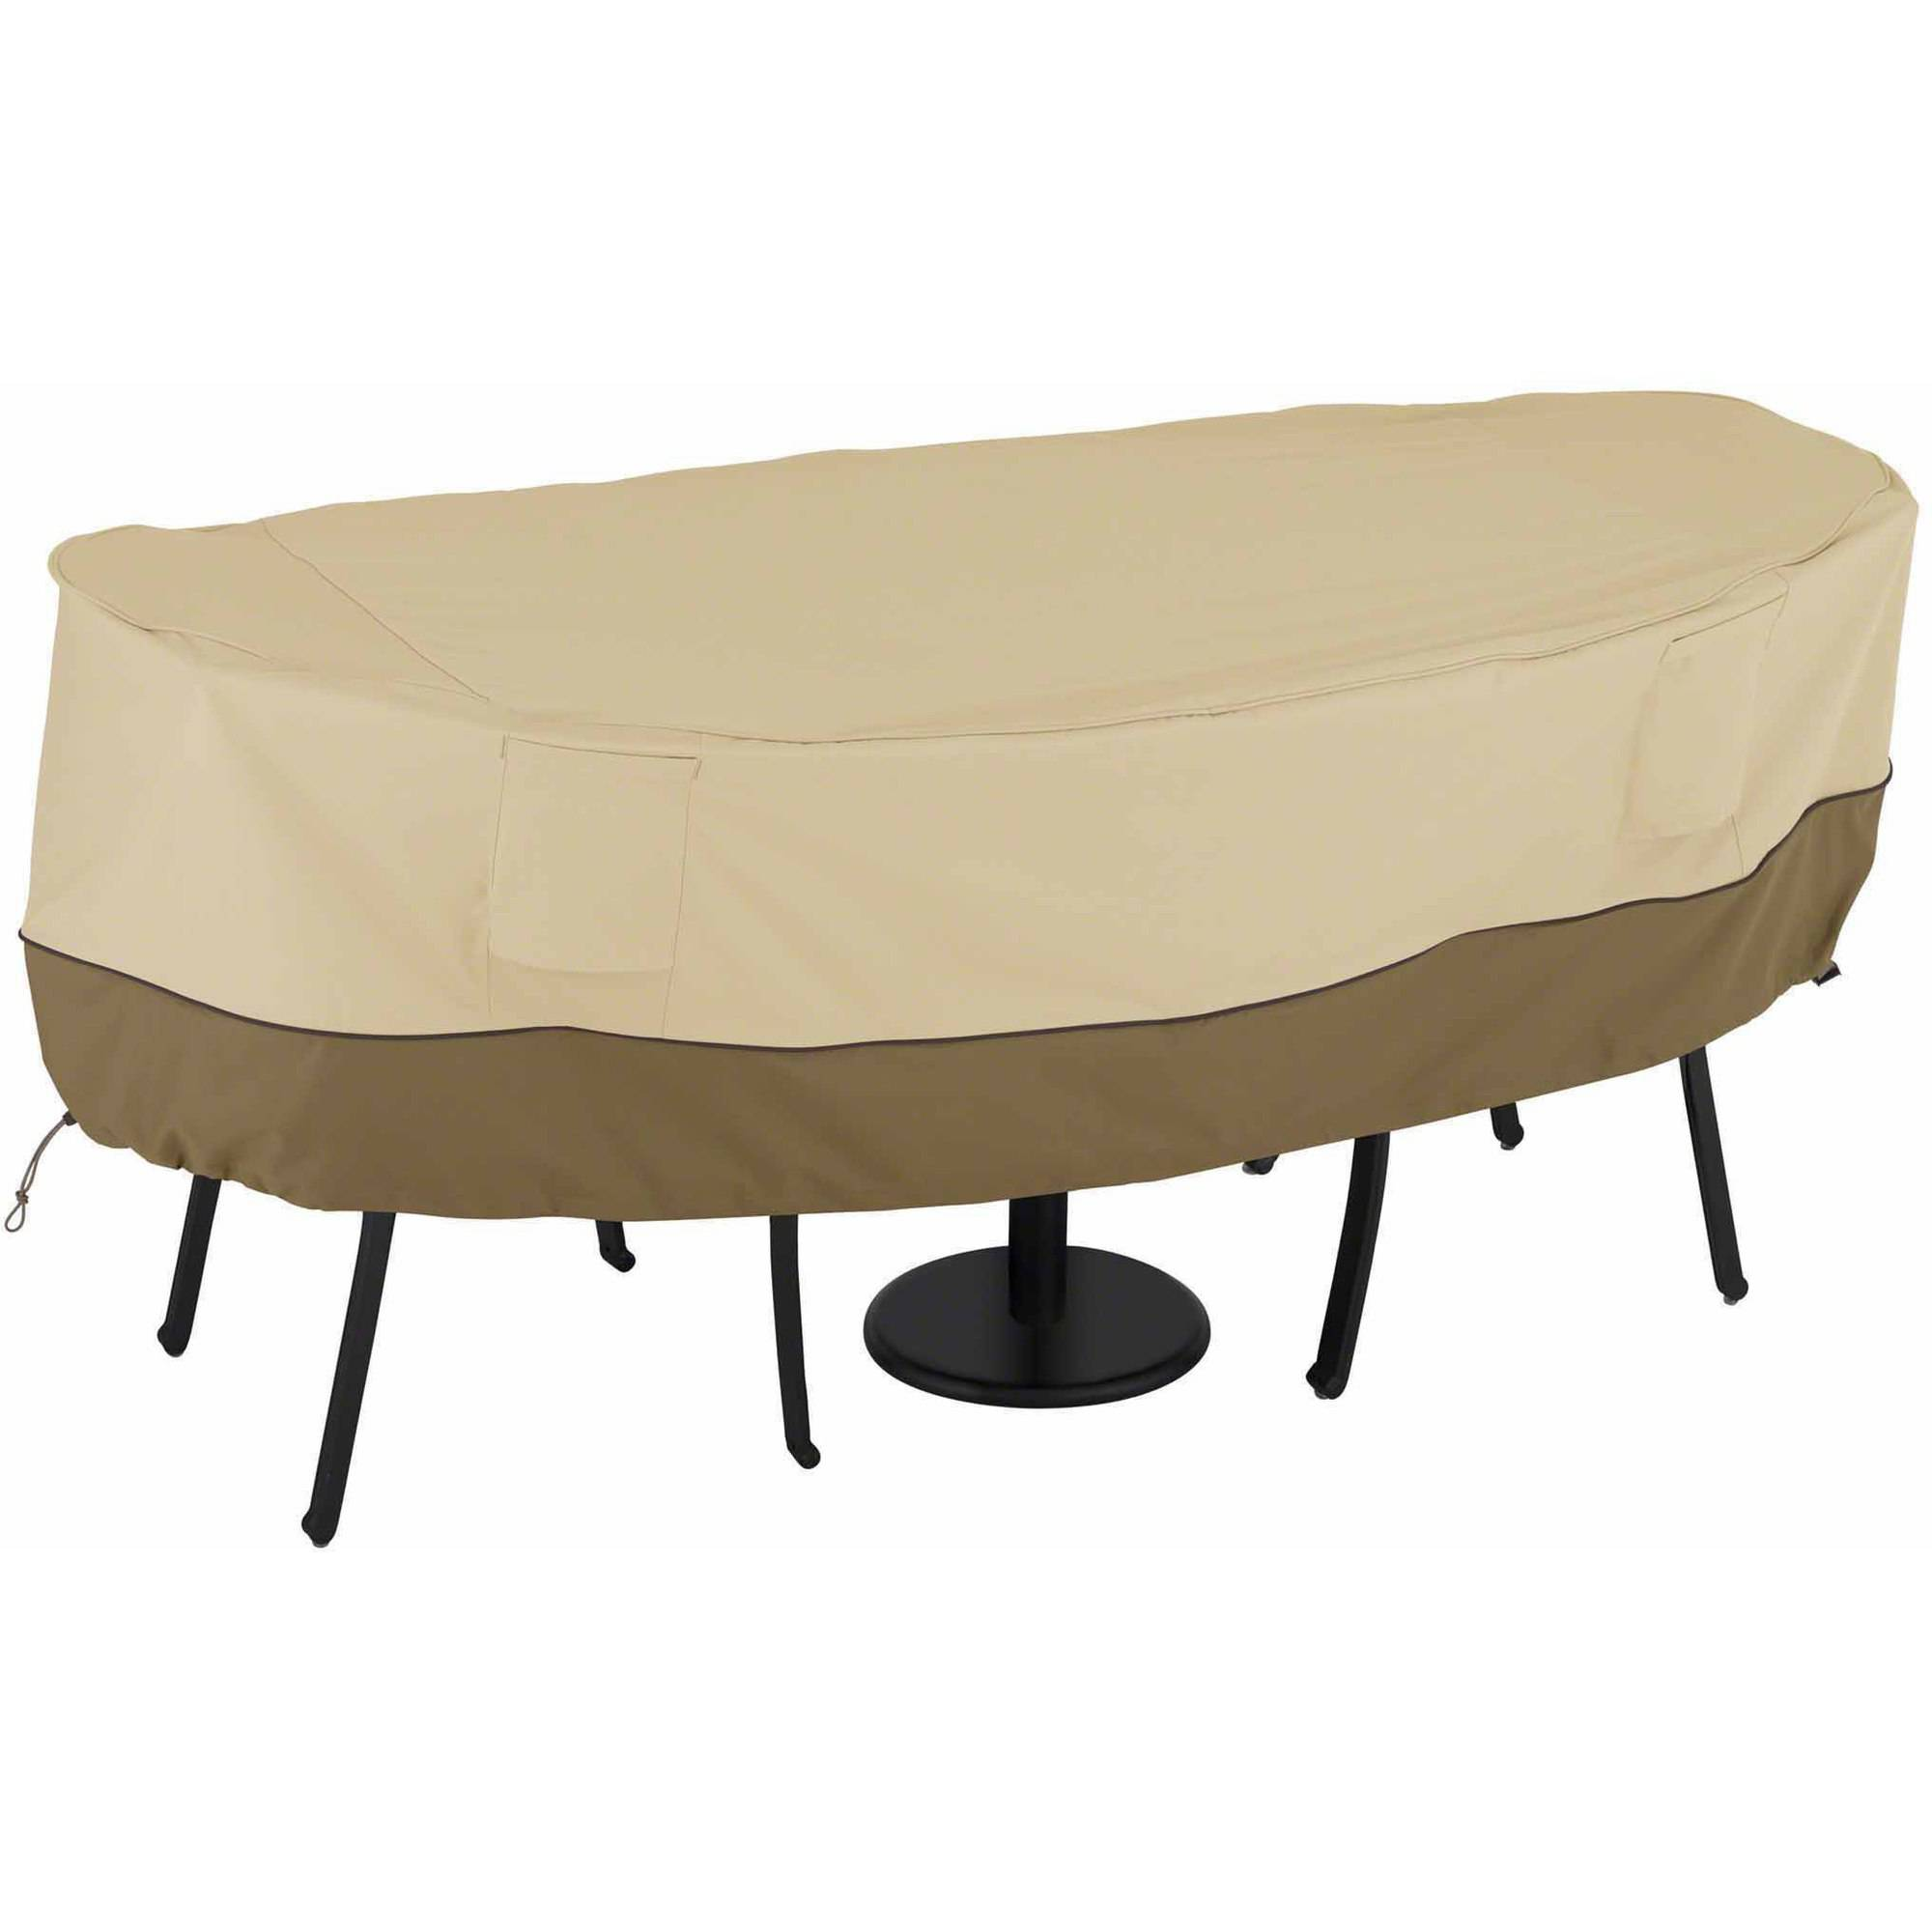 Classic Accessories Veranda Patio Bistro Table and Chair Furniture Storage Cover, Small,... by Classic Accessories